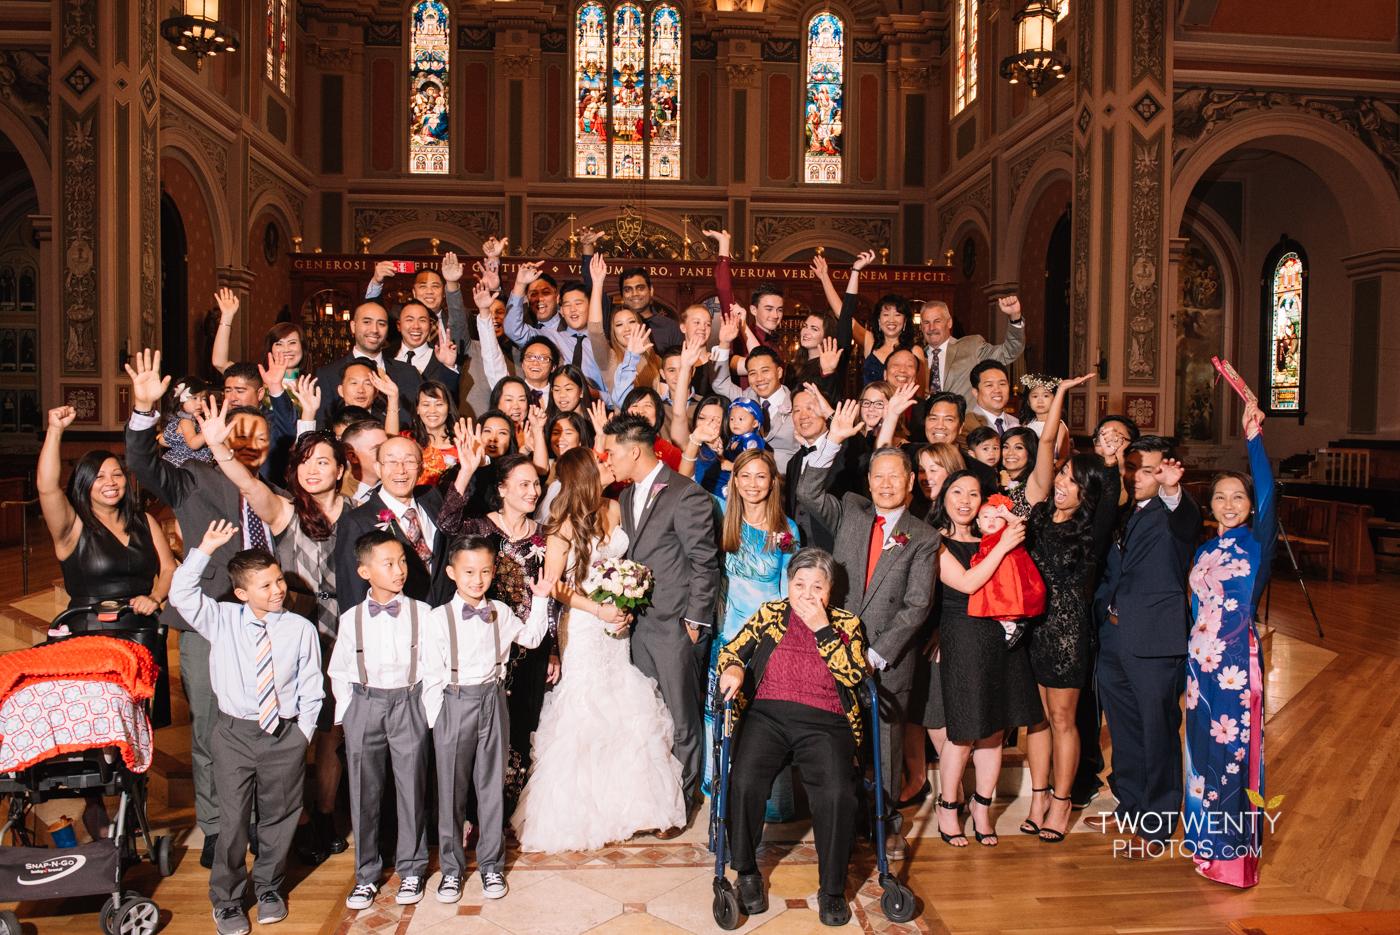 cathedral-of-the-sacred-sacrament-downtown-sacramento-wedding-photographer-40